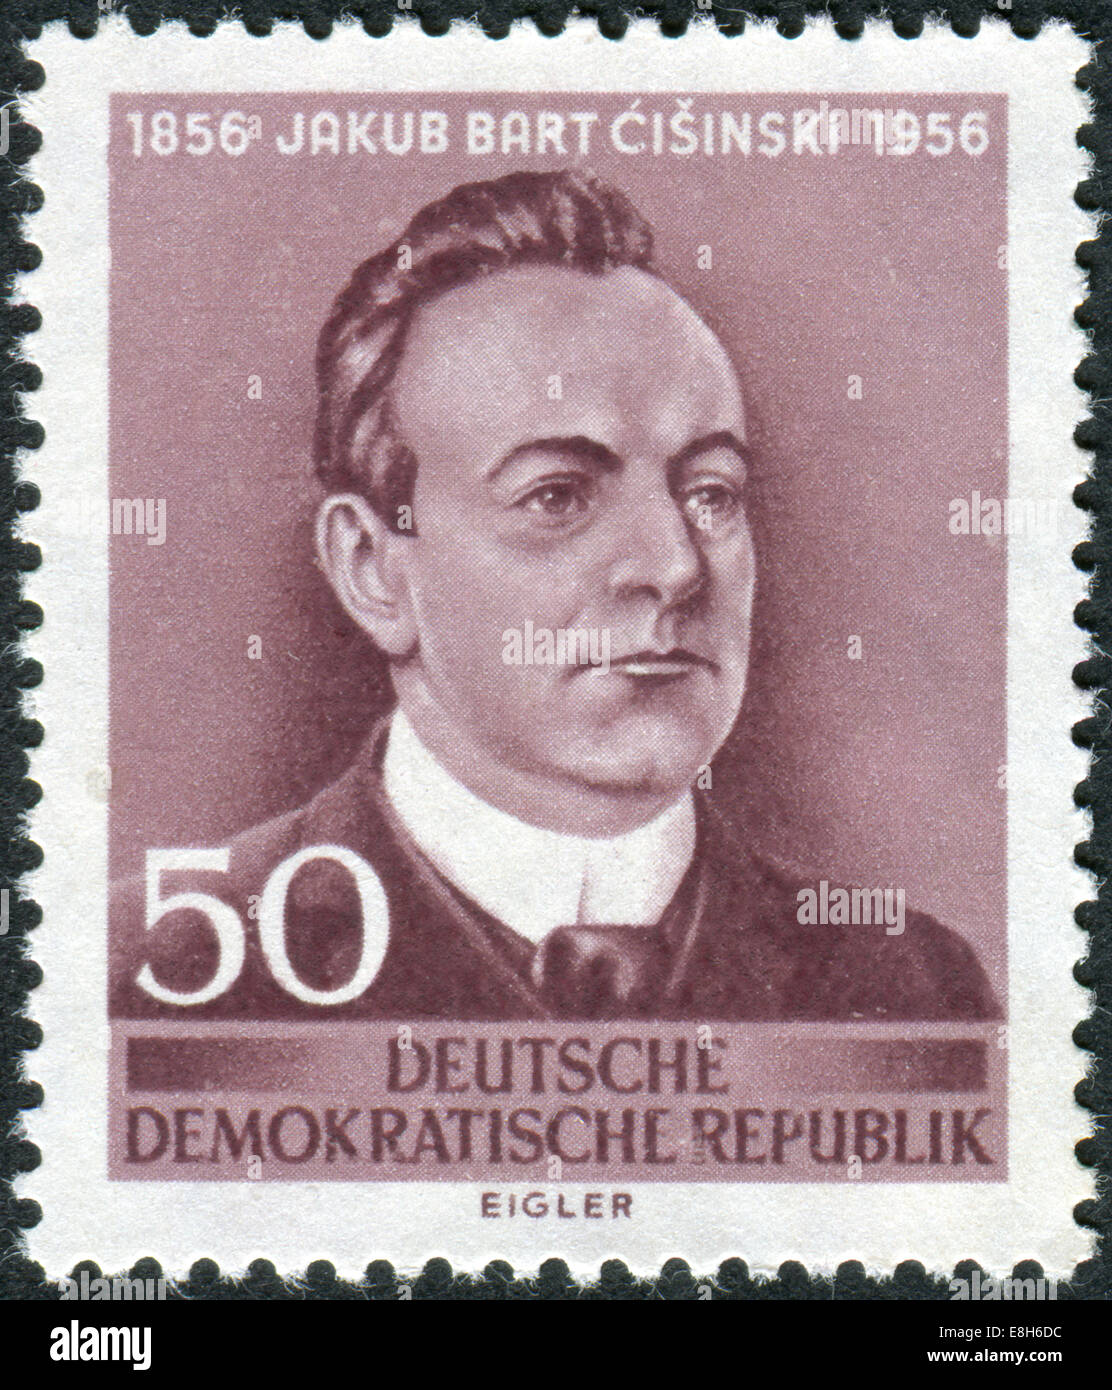 Postage stamp printed in Germany, shows portrait Jakub Bart-Cisinski, Sorbian poet, writer and playwrighter - Stock Image